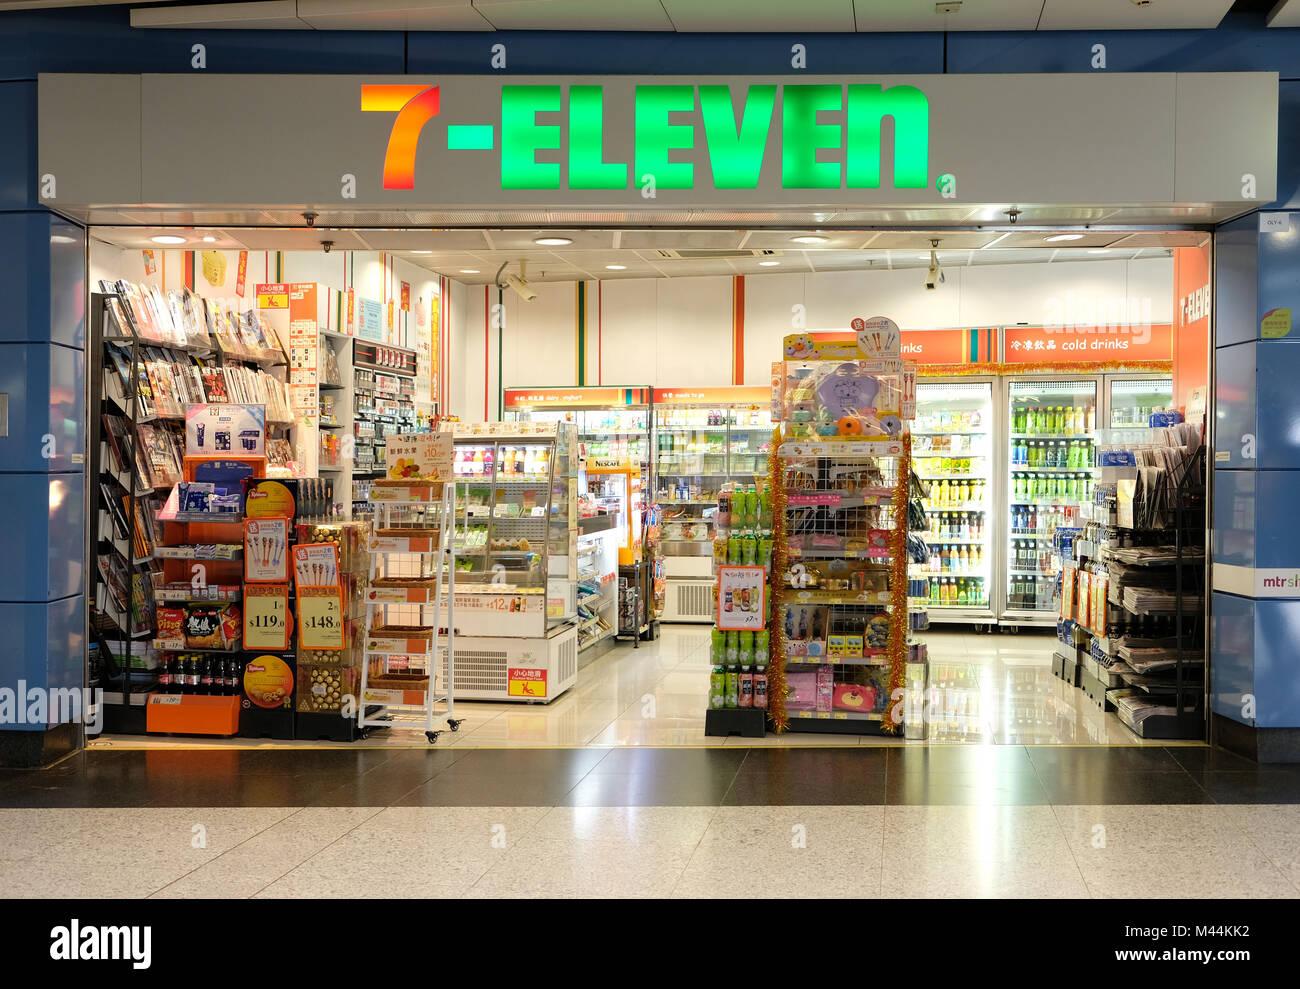 7 Eleven Convenience Store Stock Photos Amp 7 Eleven